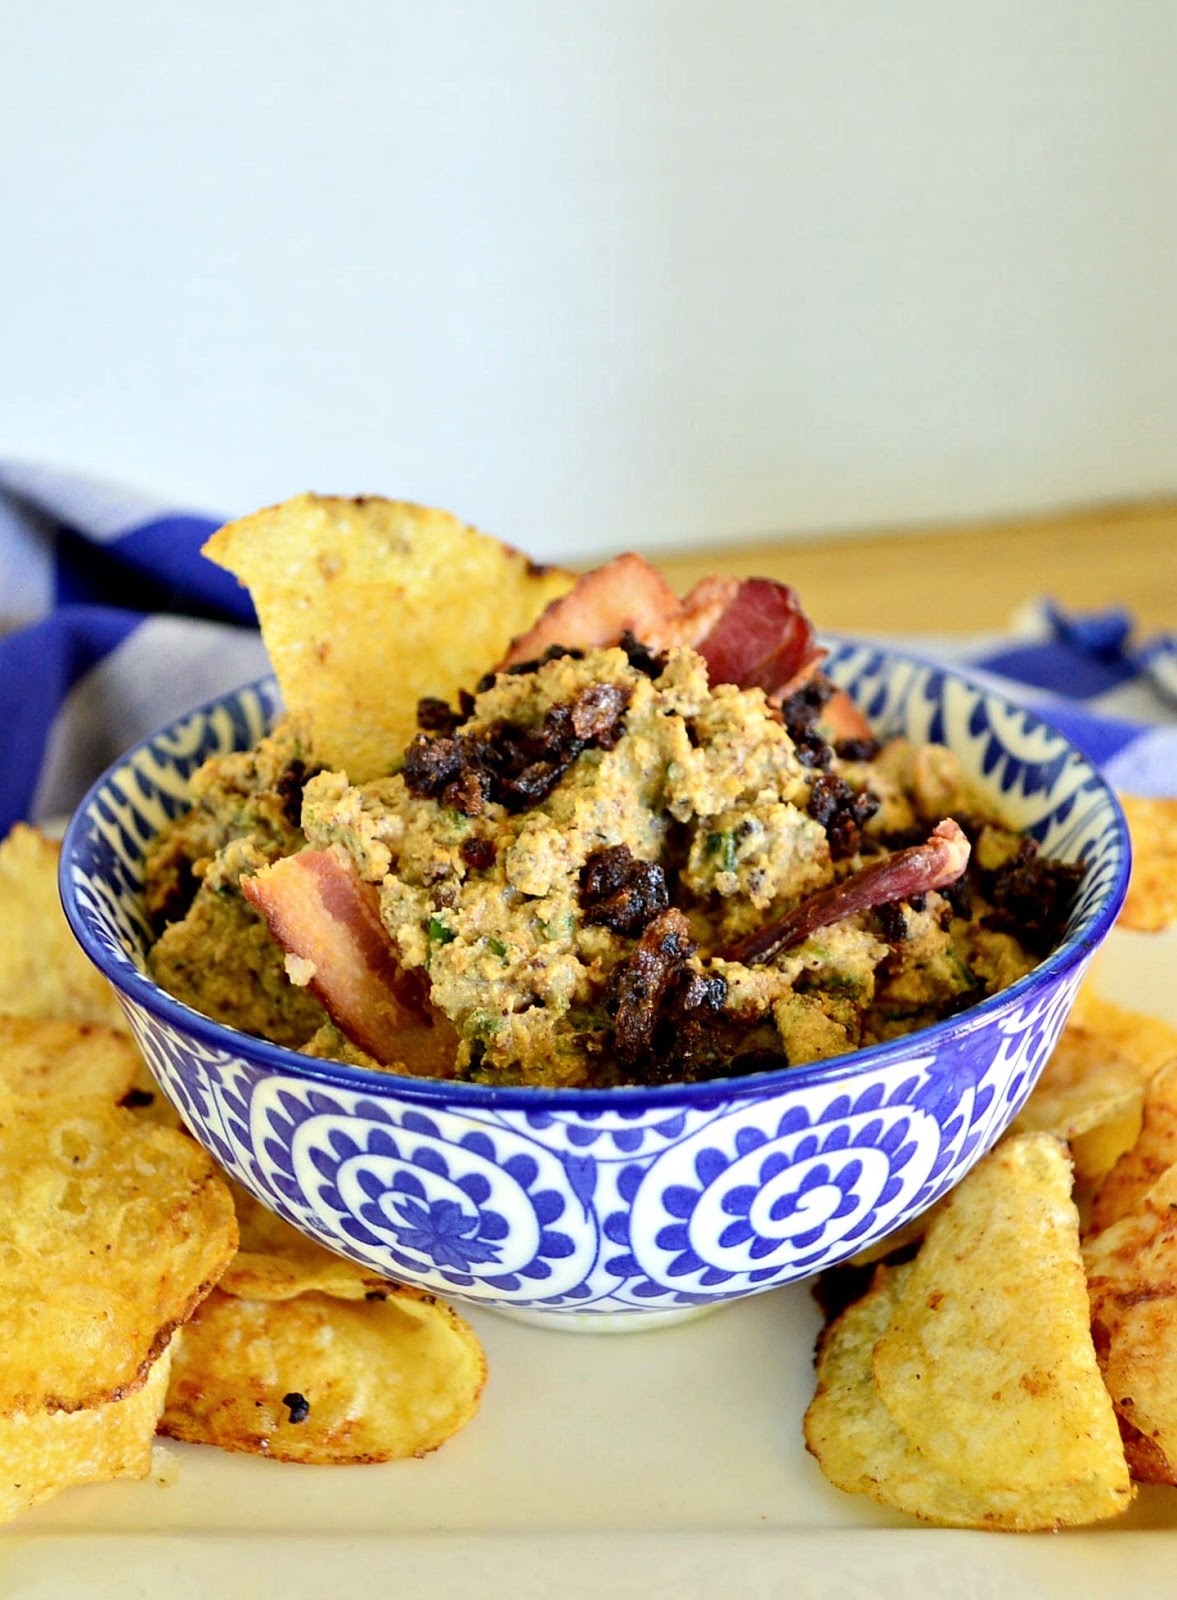 Bacon Jam, horseradish and ricotta dip